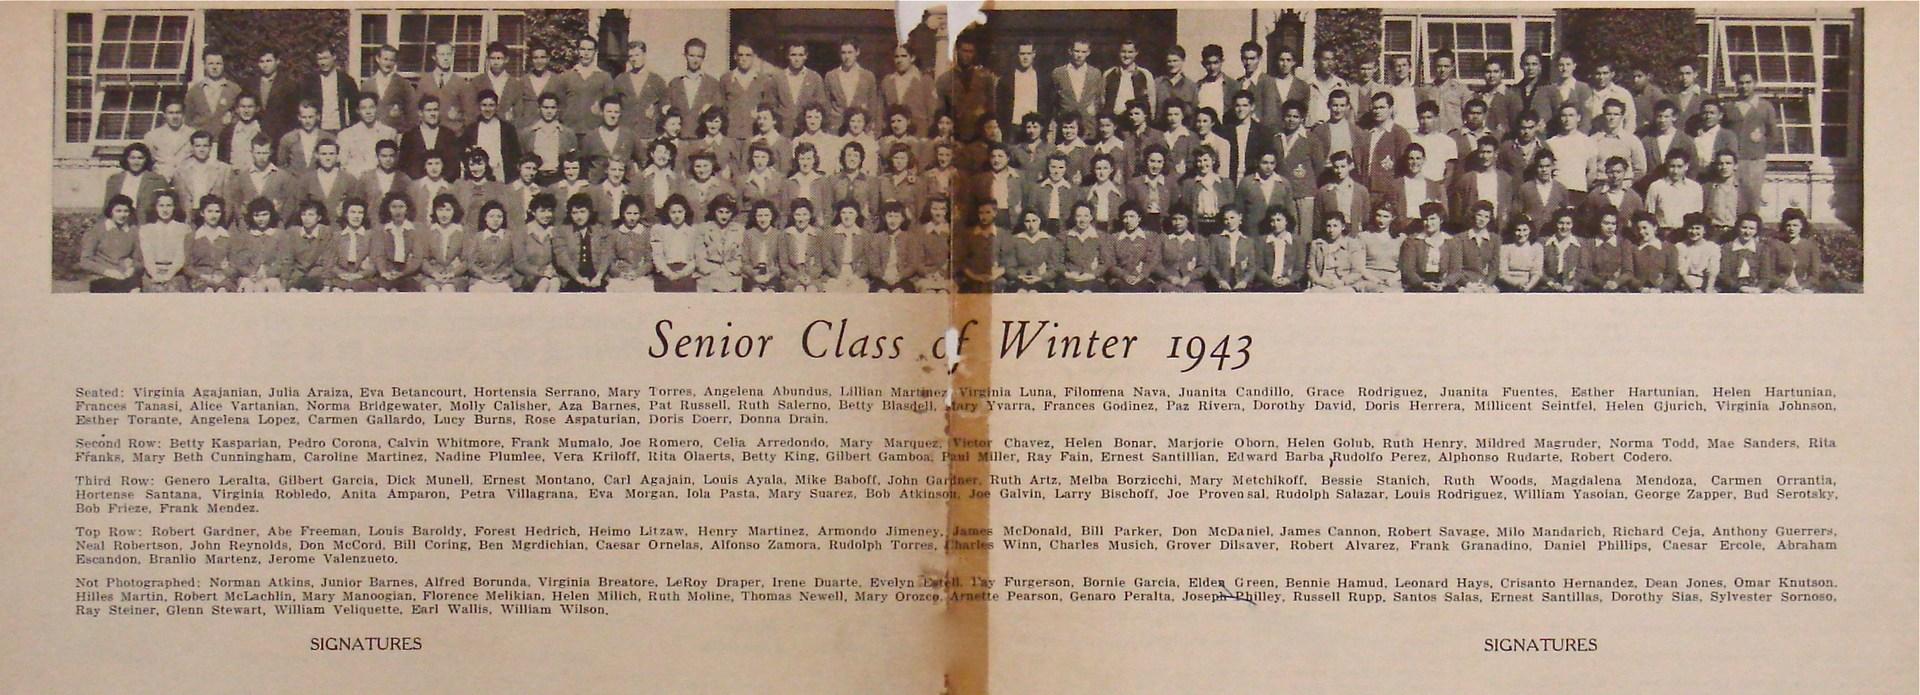 Senior class 1943